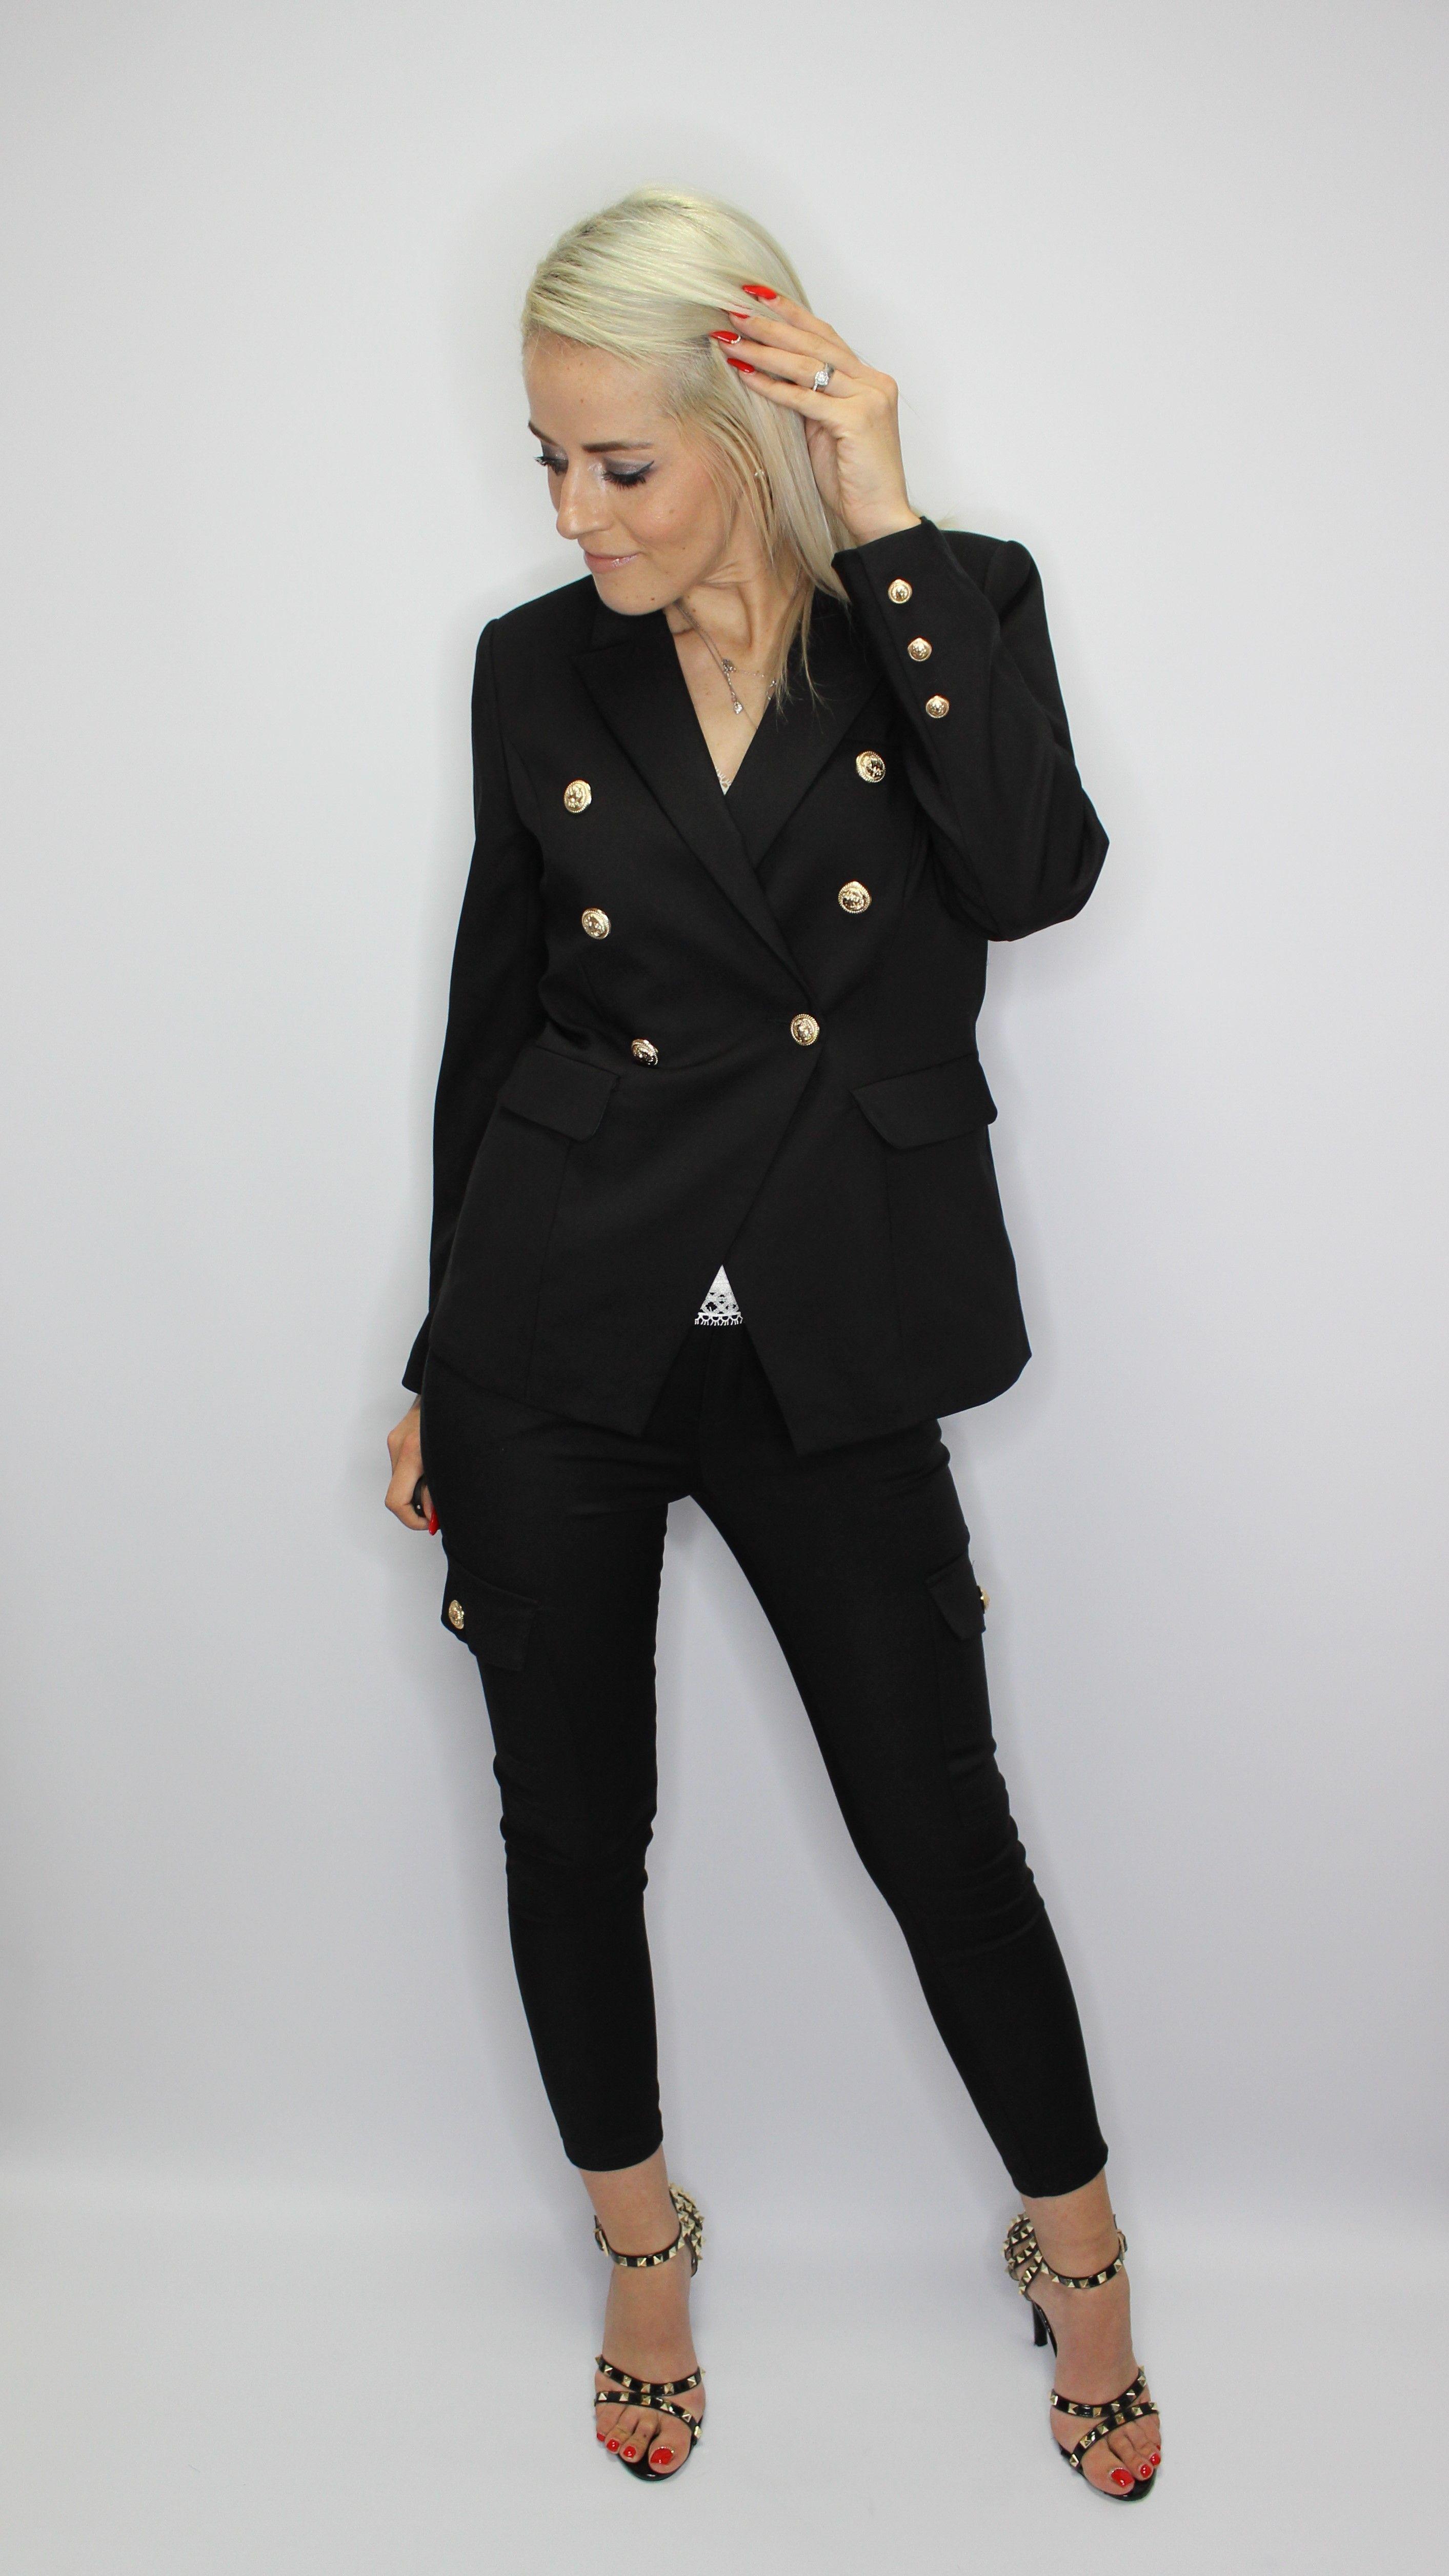 Black Balmain Style Blazer